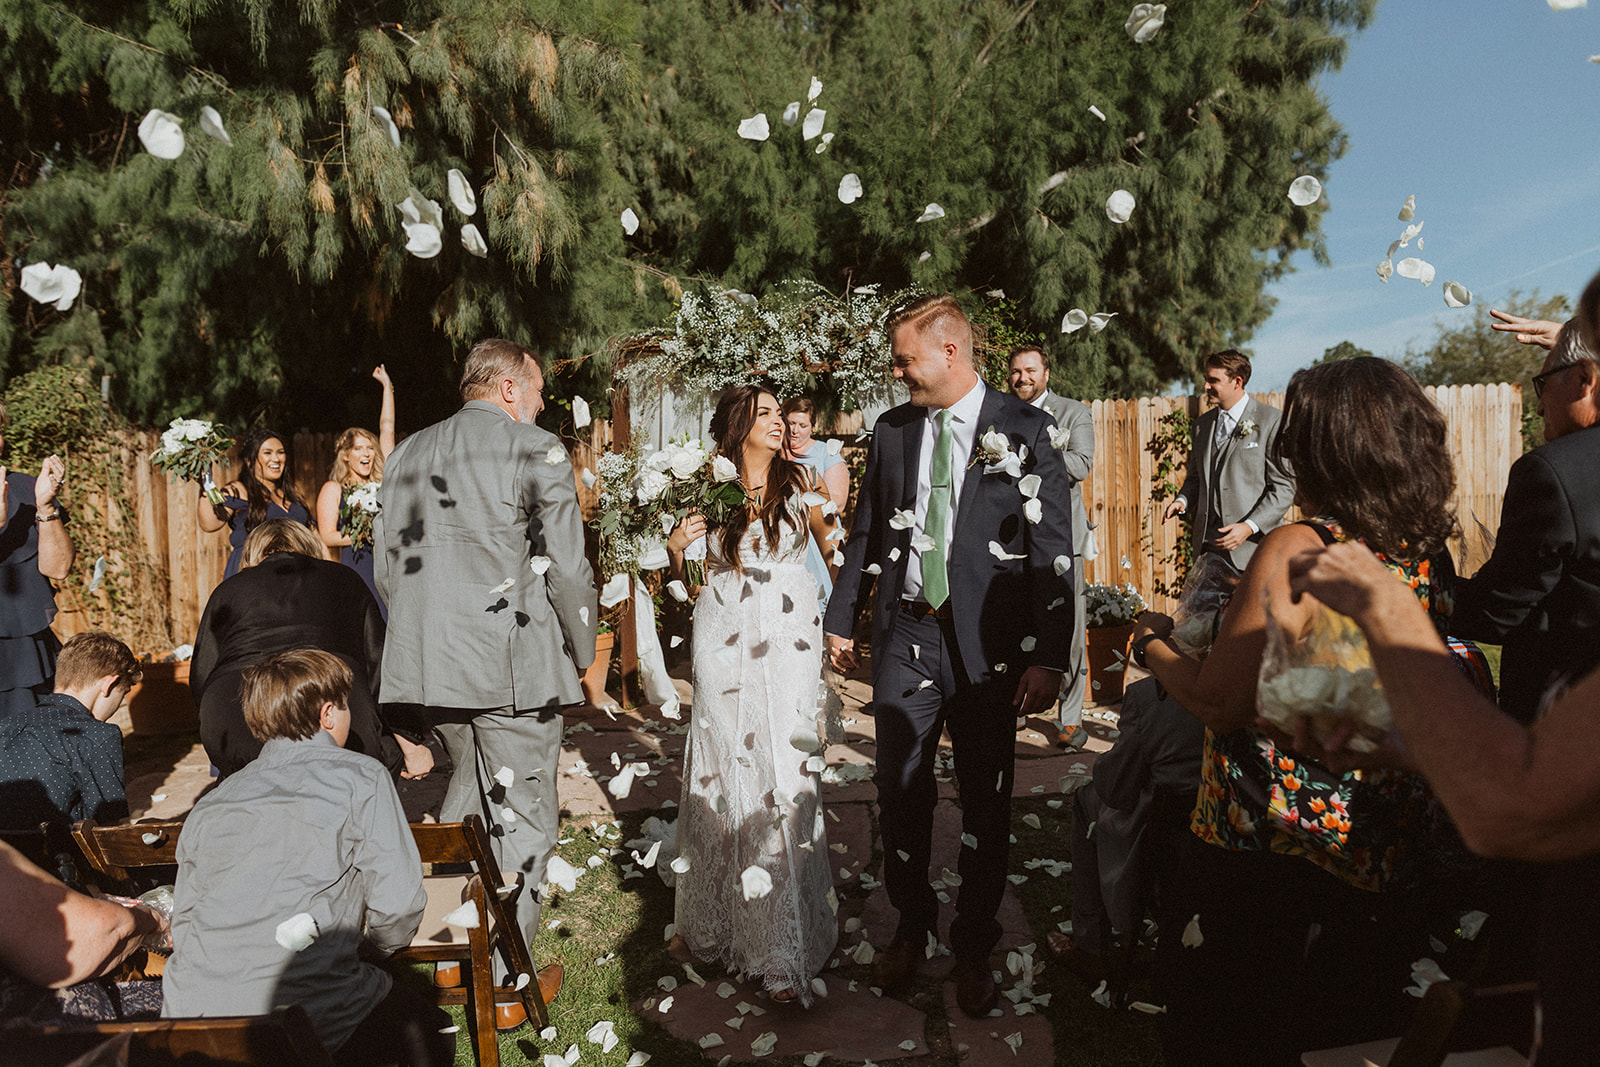 flower_petals_after_wedding_ceremony.jpeg